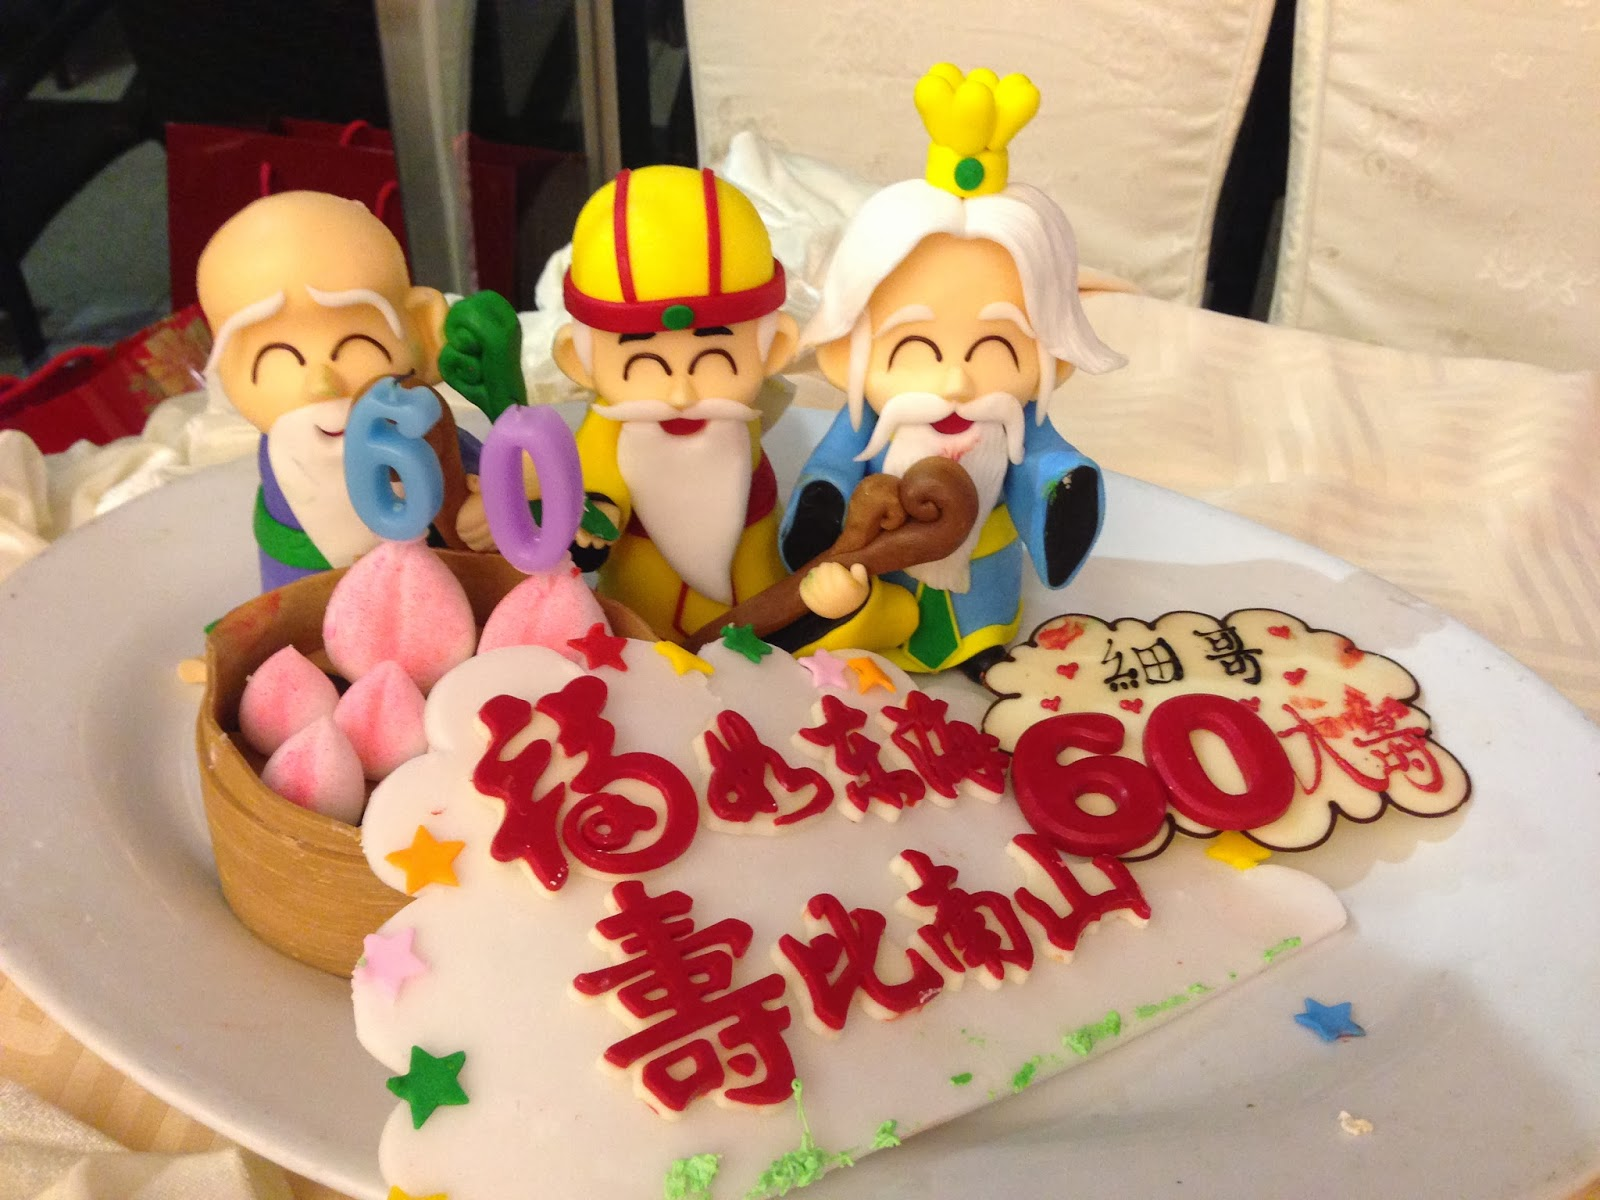 Our Memory: 爸爸60歲大壽 - 2014年1月24日